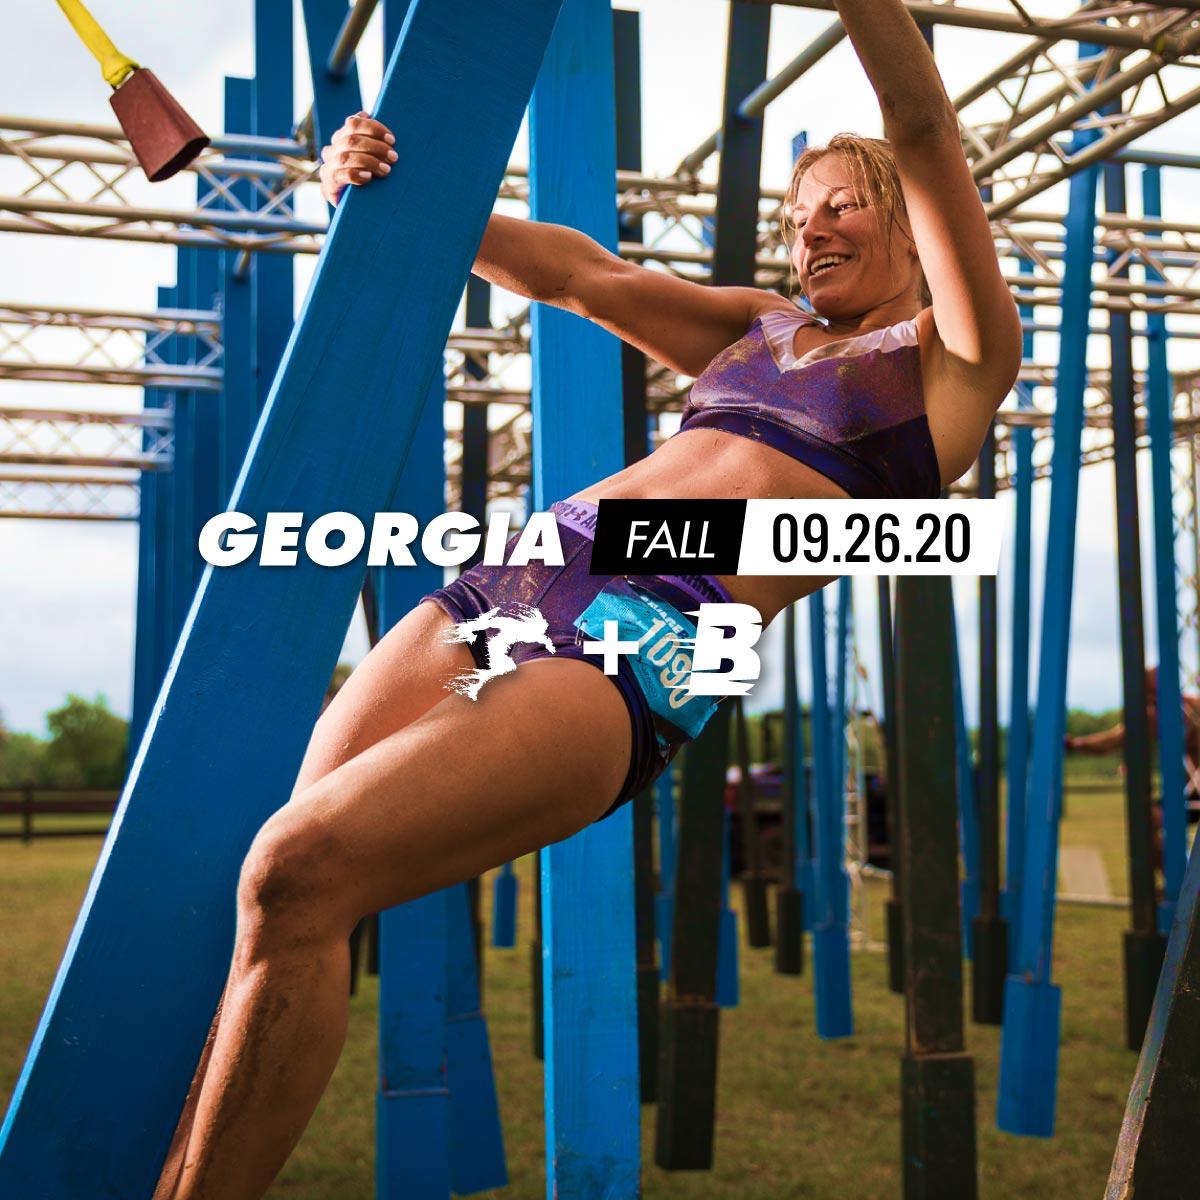 Spectator Pass - Savage Race Georgia Fall 2020